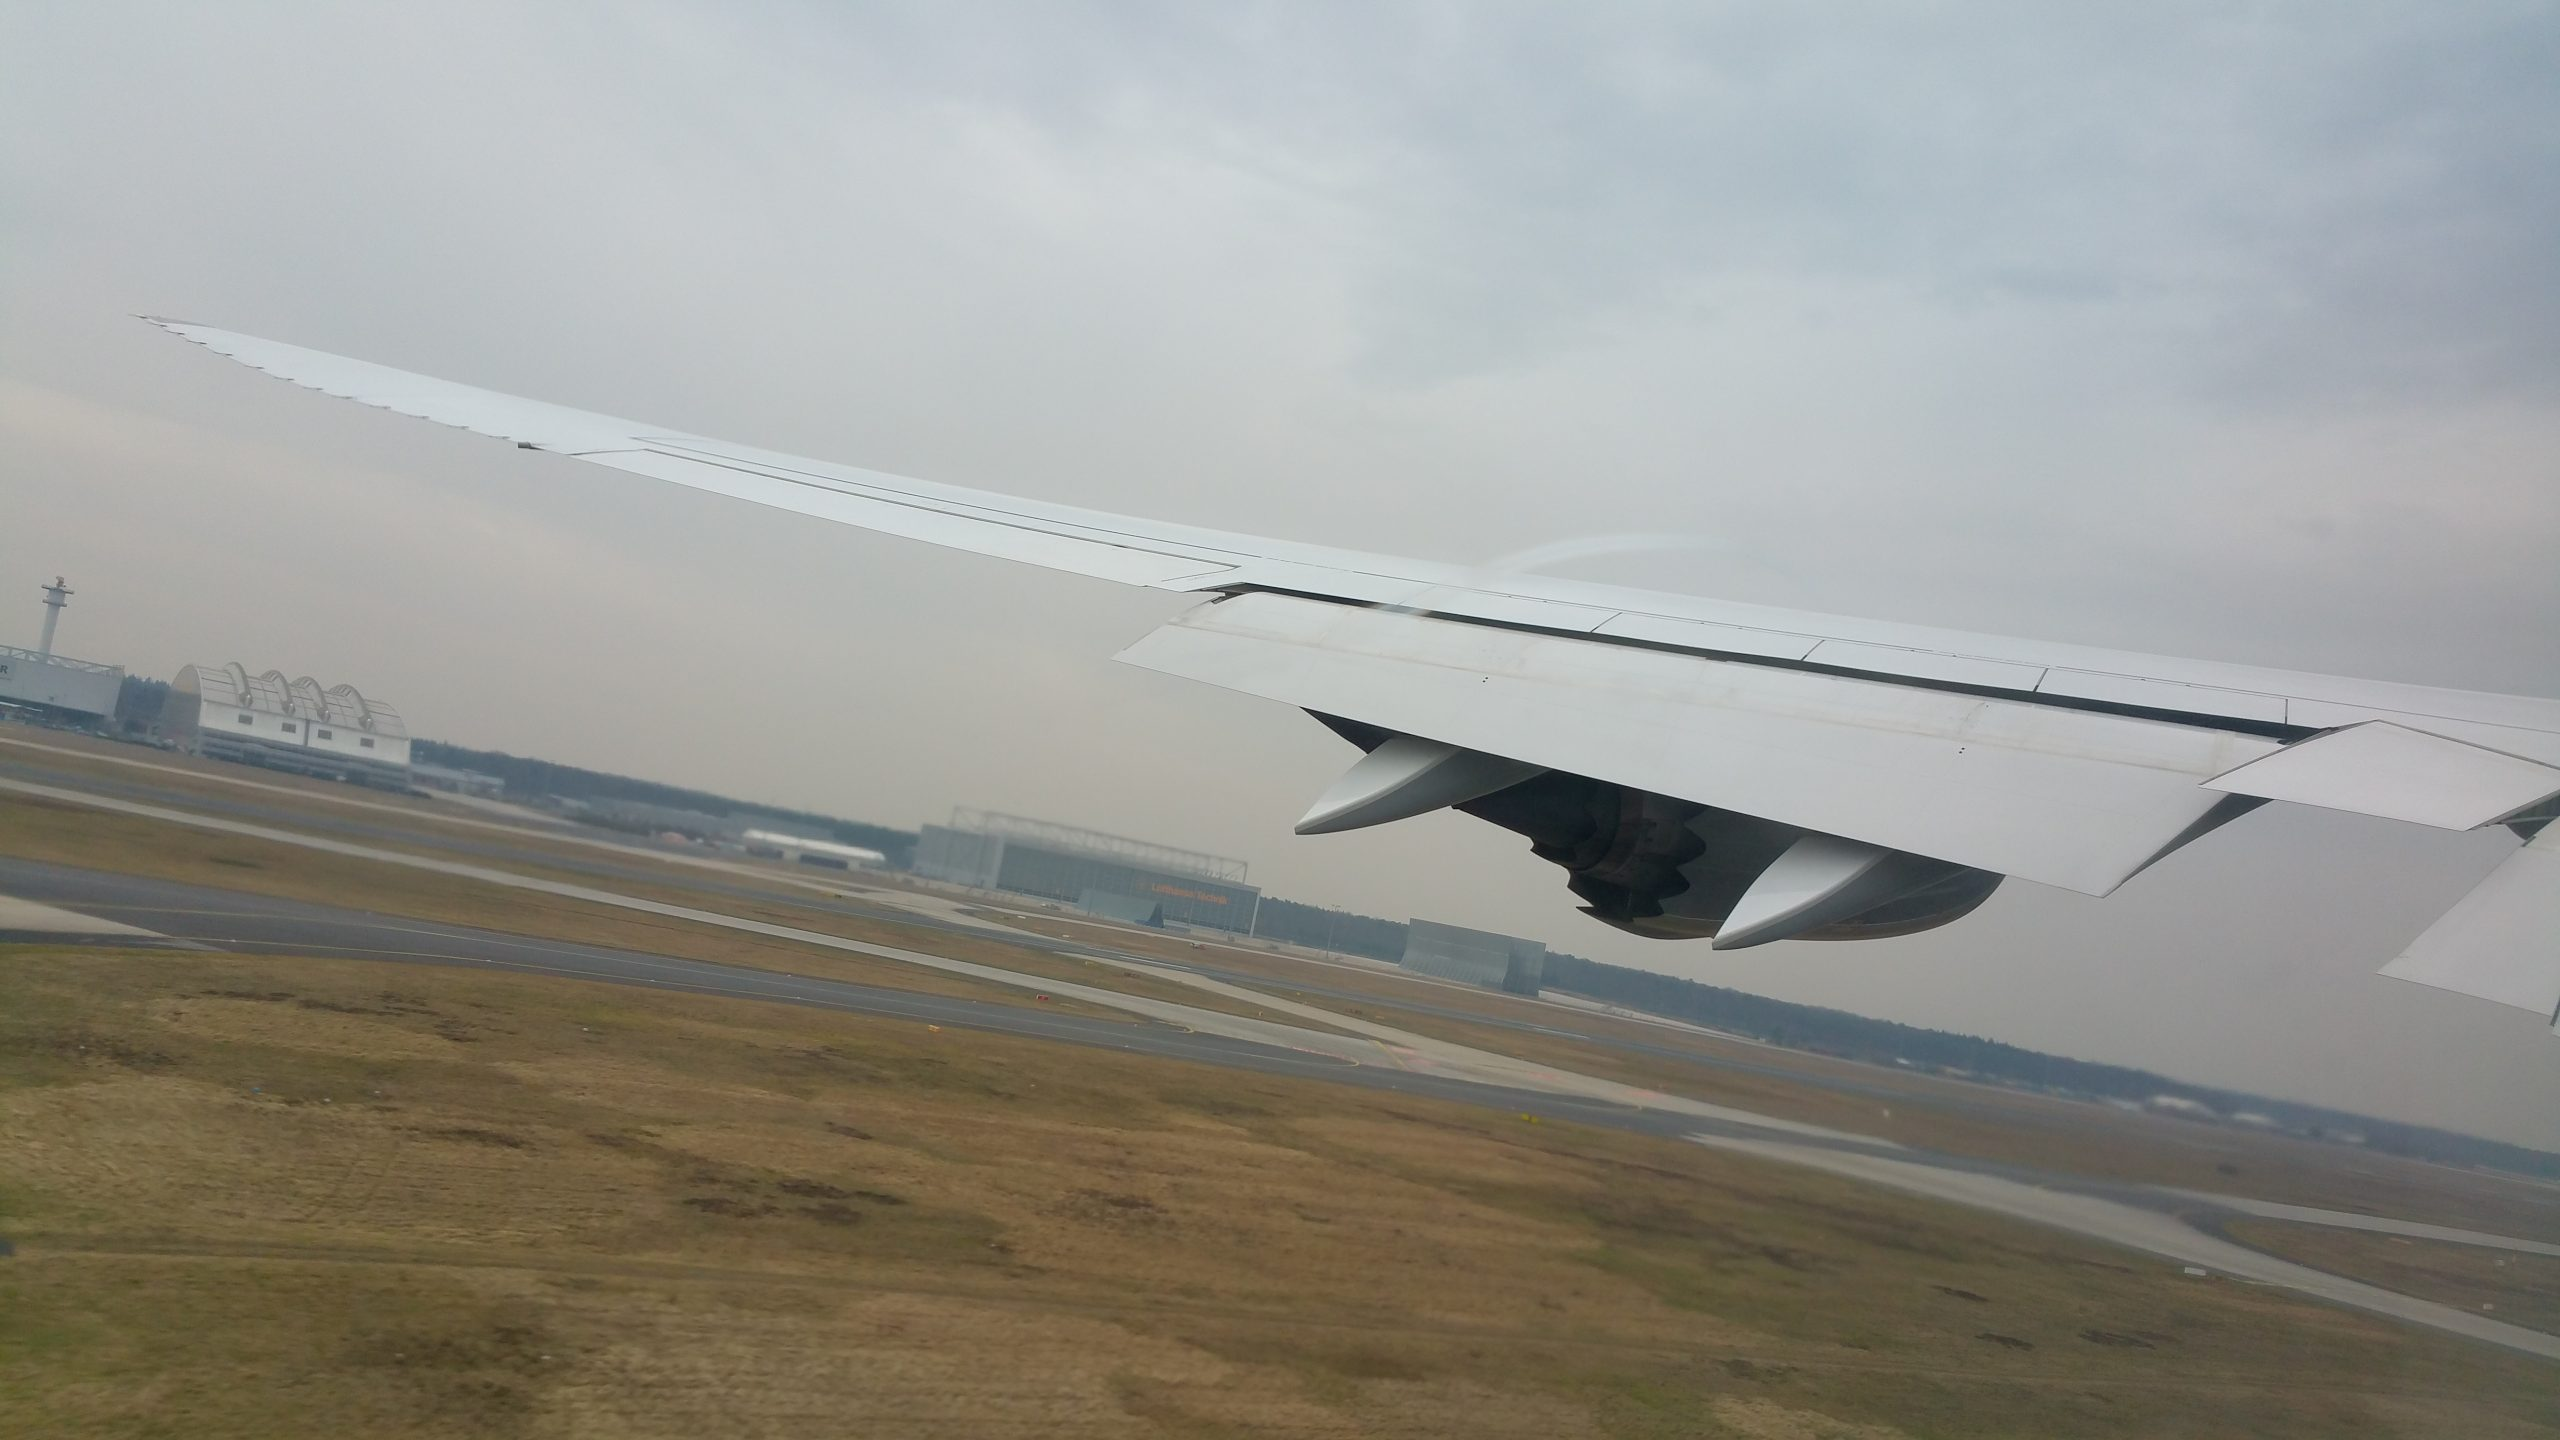 Lufthansa Boeing 747-8 Taking Off From Frankfurt Main Airport (FRA)